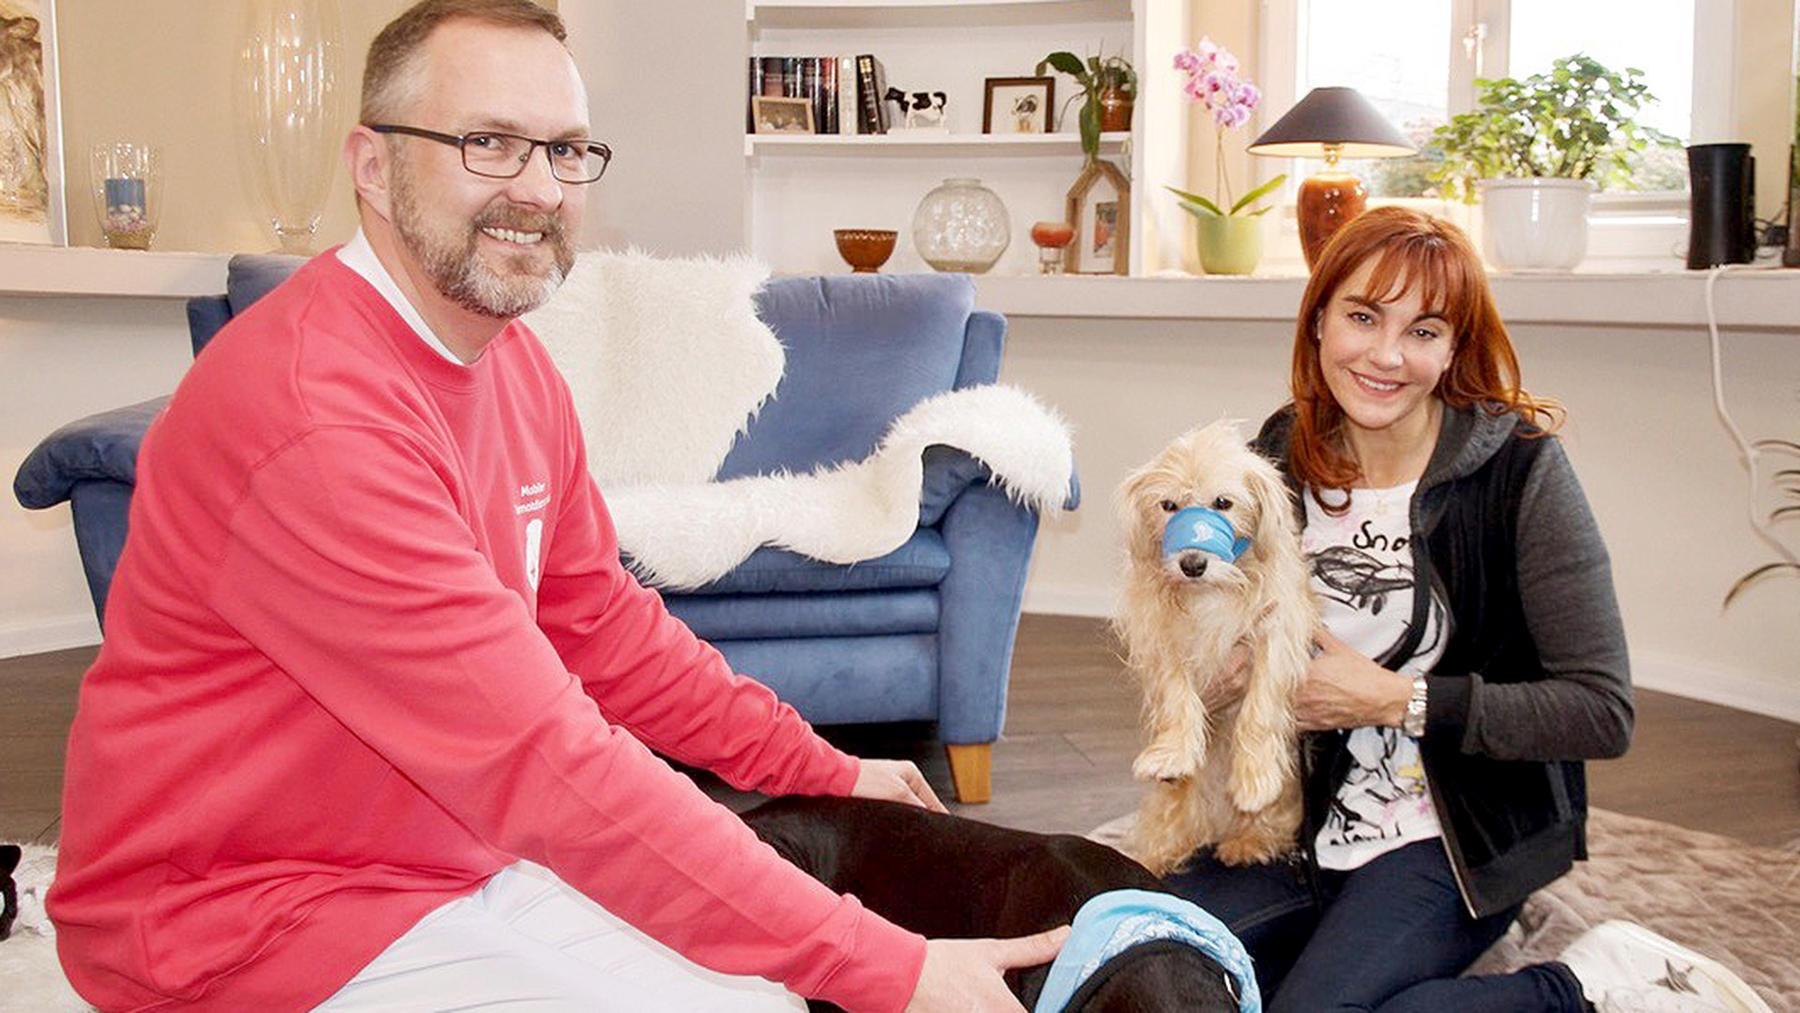 Thema heute u.a.: Erste Hilfe bei Hund & Katze